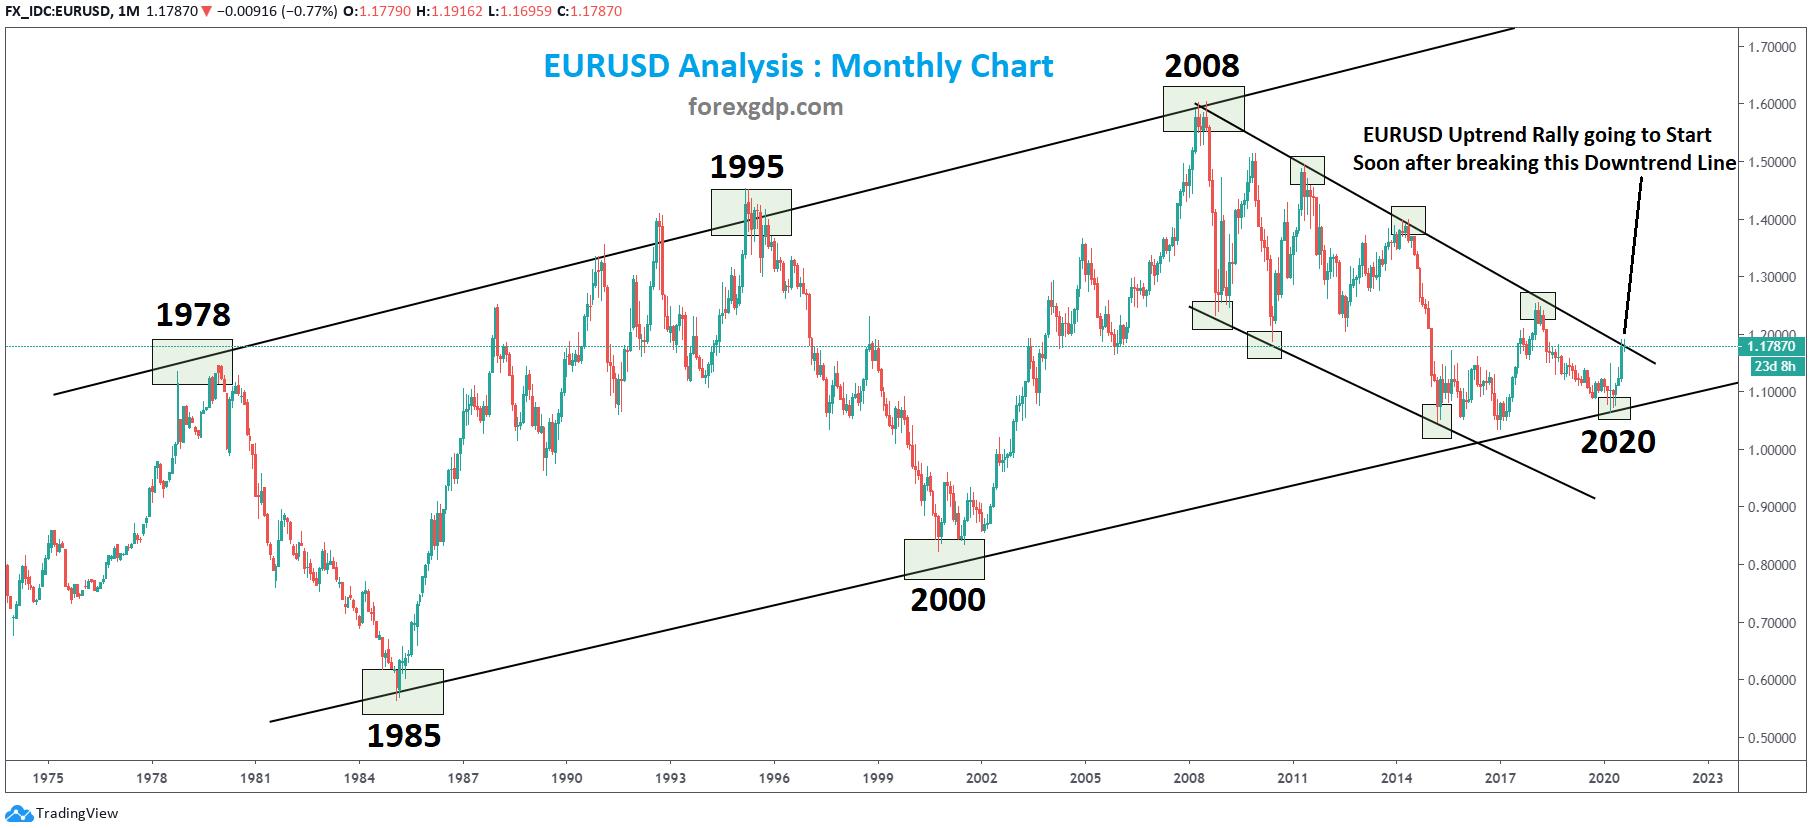 EURUSD Monthly analysis technical chart